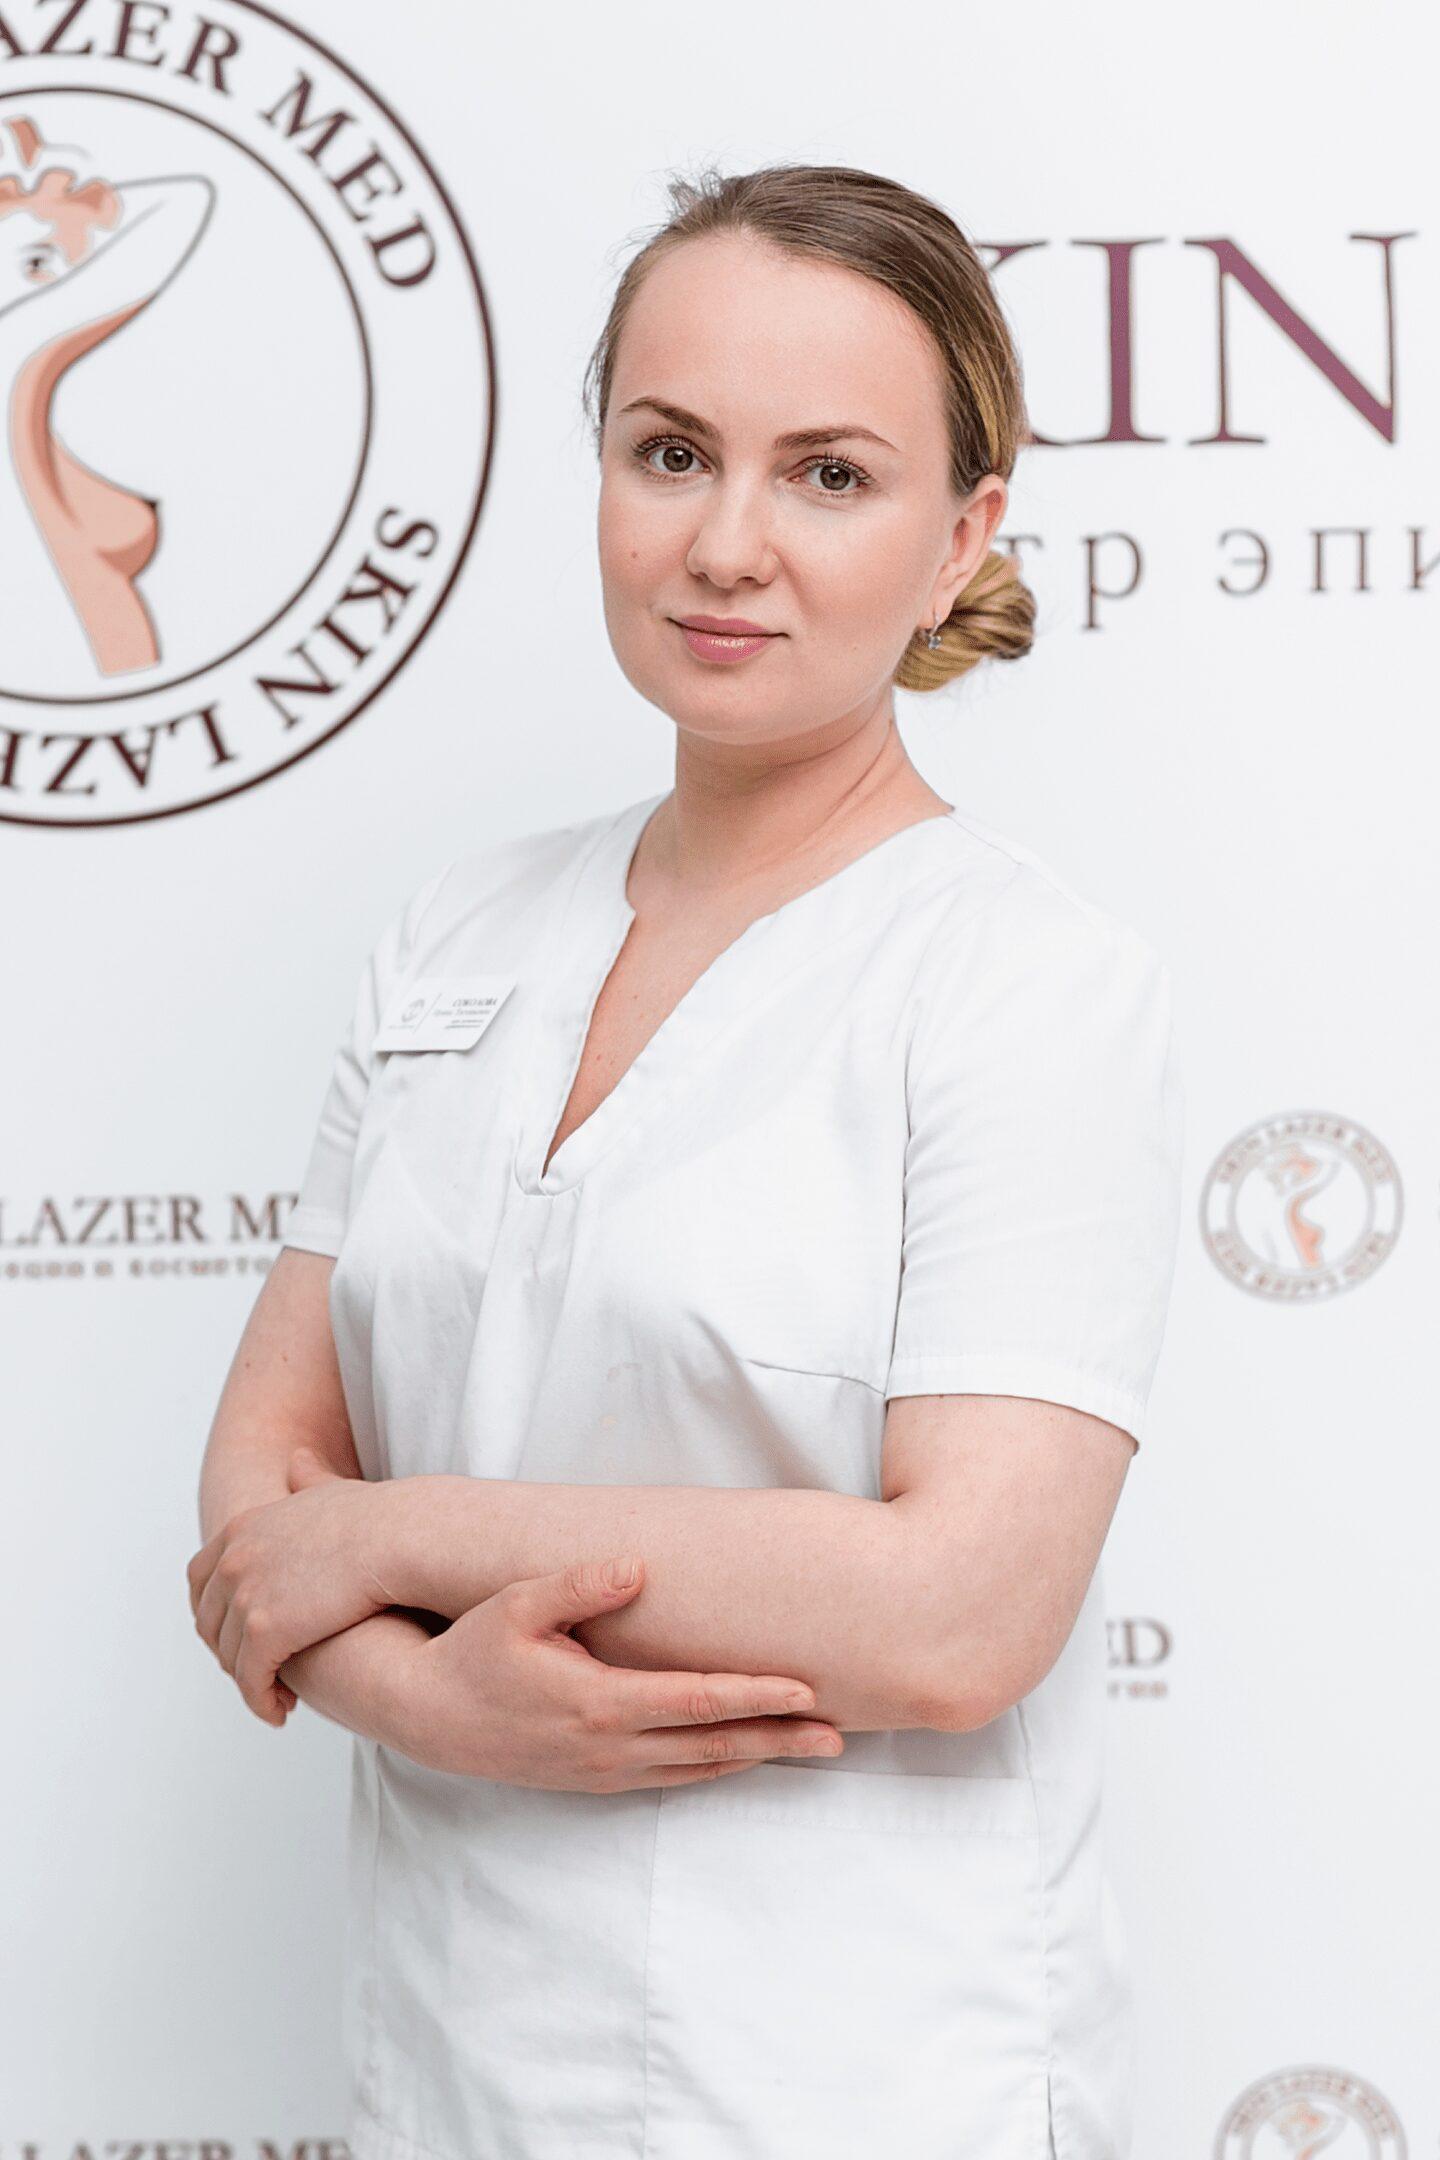 Иванова Ирина Евгеньевна (Соколова), врач дерматовенеролог, косметолог